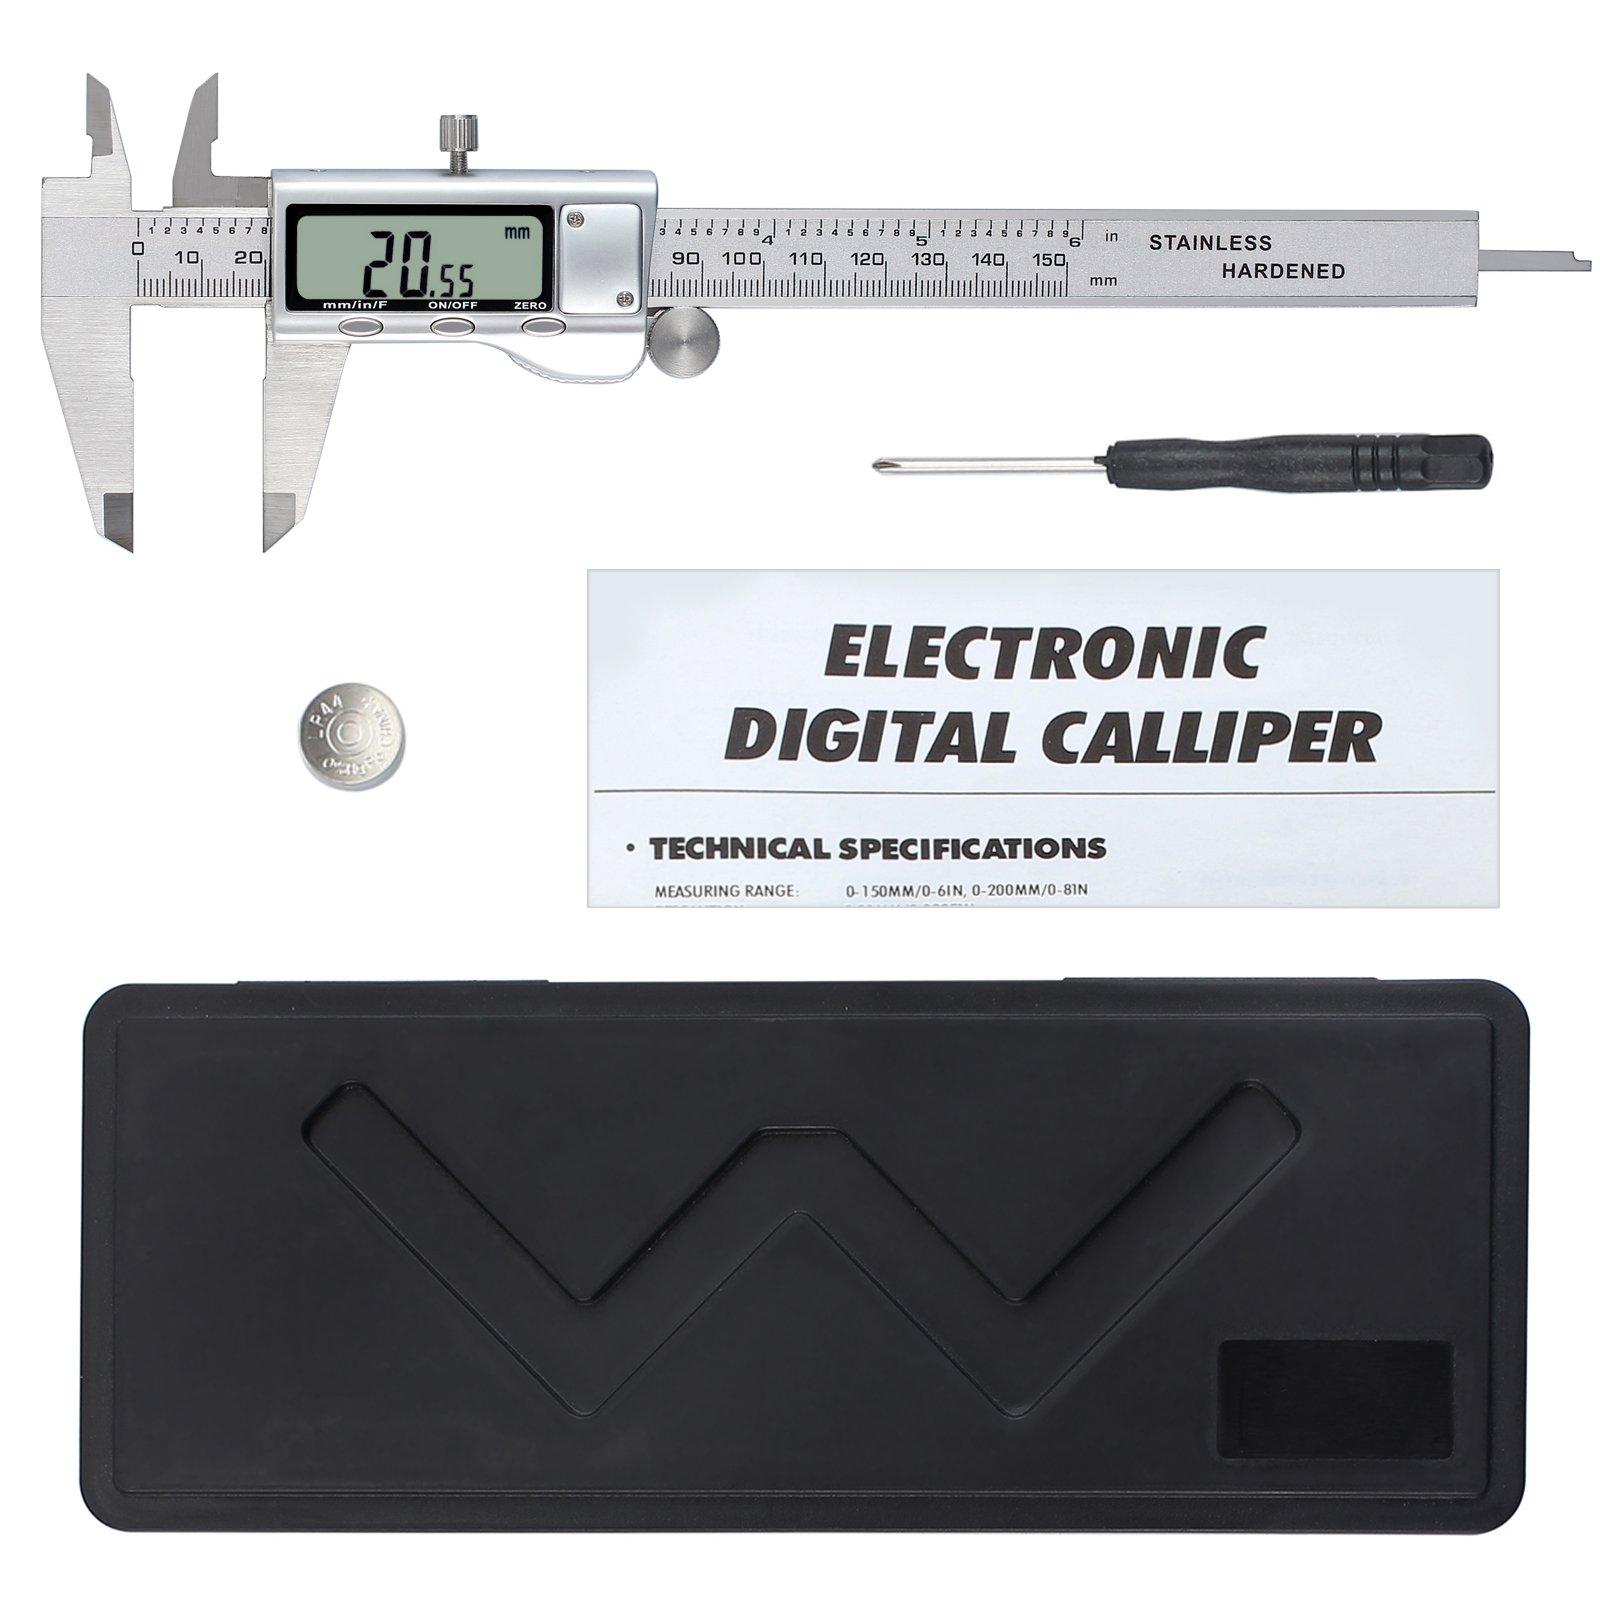 Neoteck 150mm/6Inch Stainless Steel Digital Vernier Caliper Electronic Caliper Fractions/Inch/Metric Conversion Measuring Tool for Length Width Depth Inner Diameter Outer Diameter